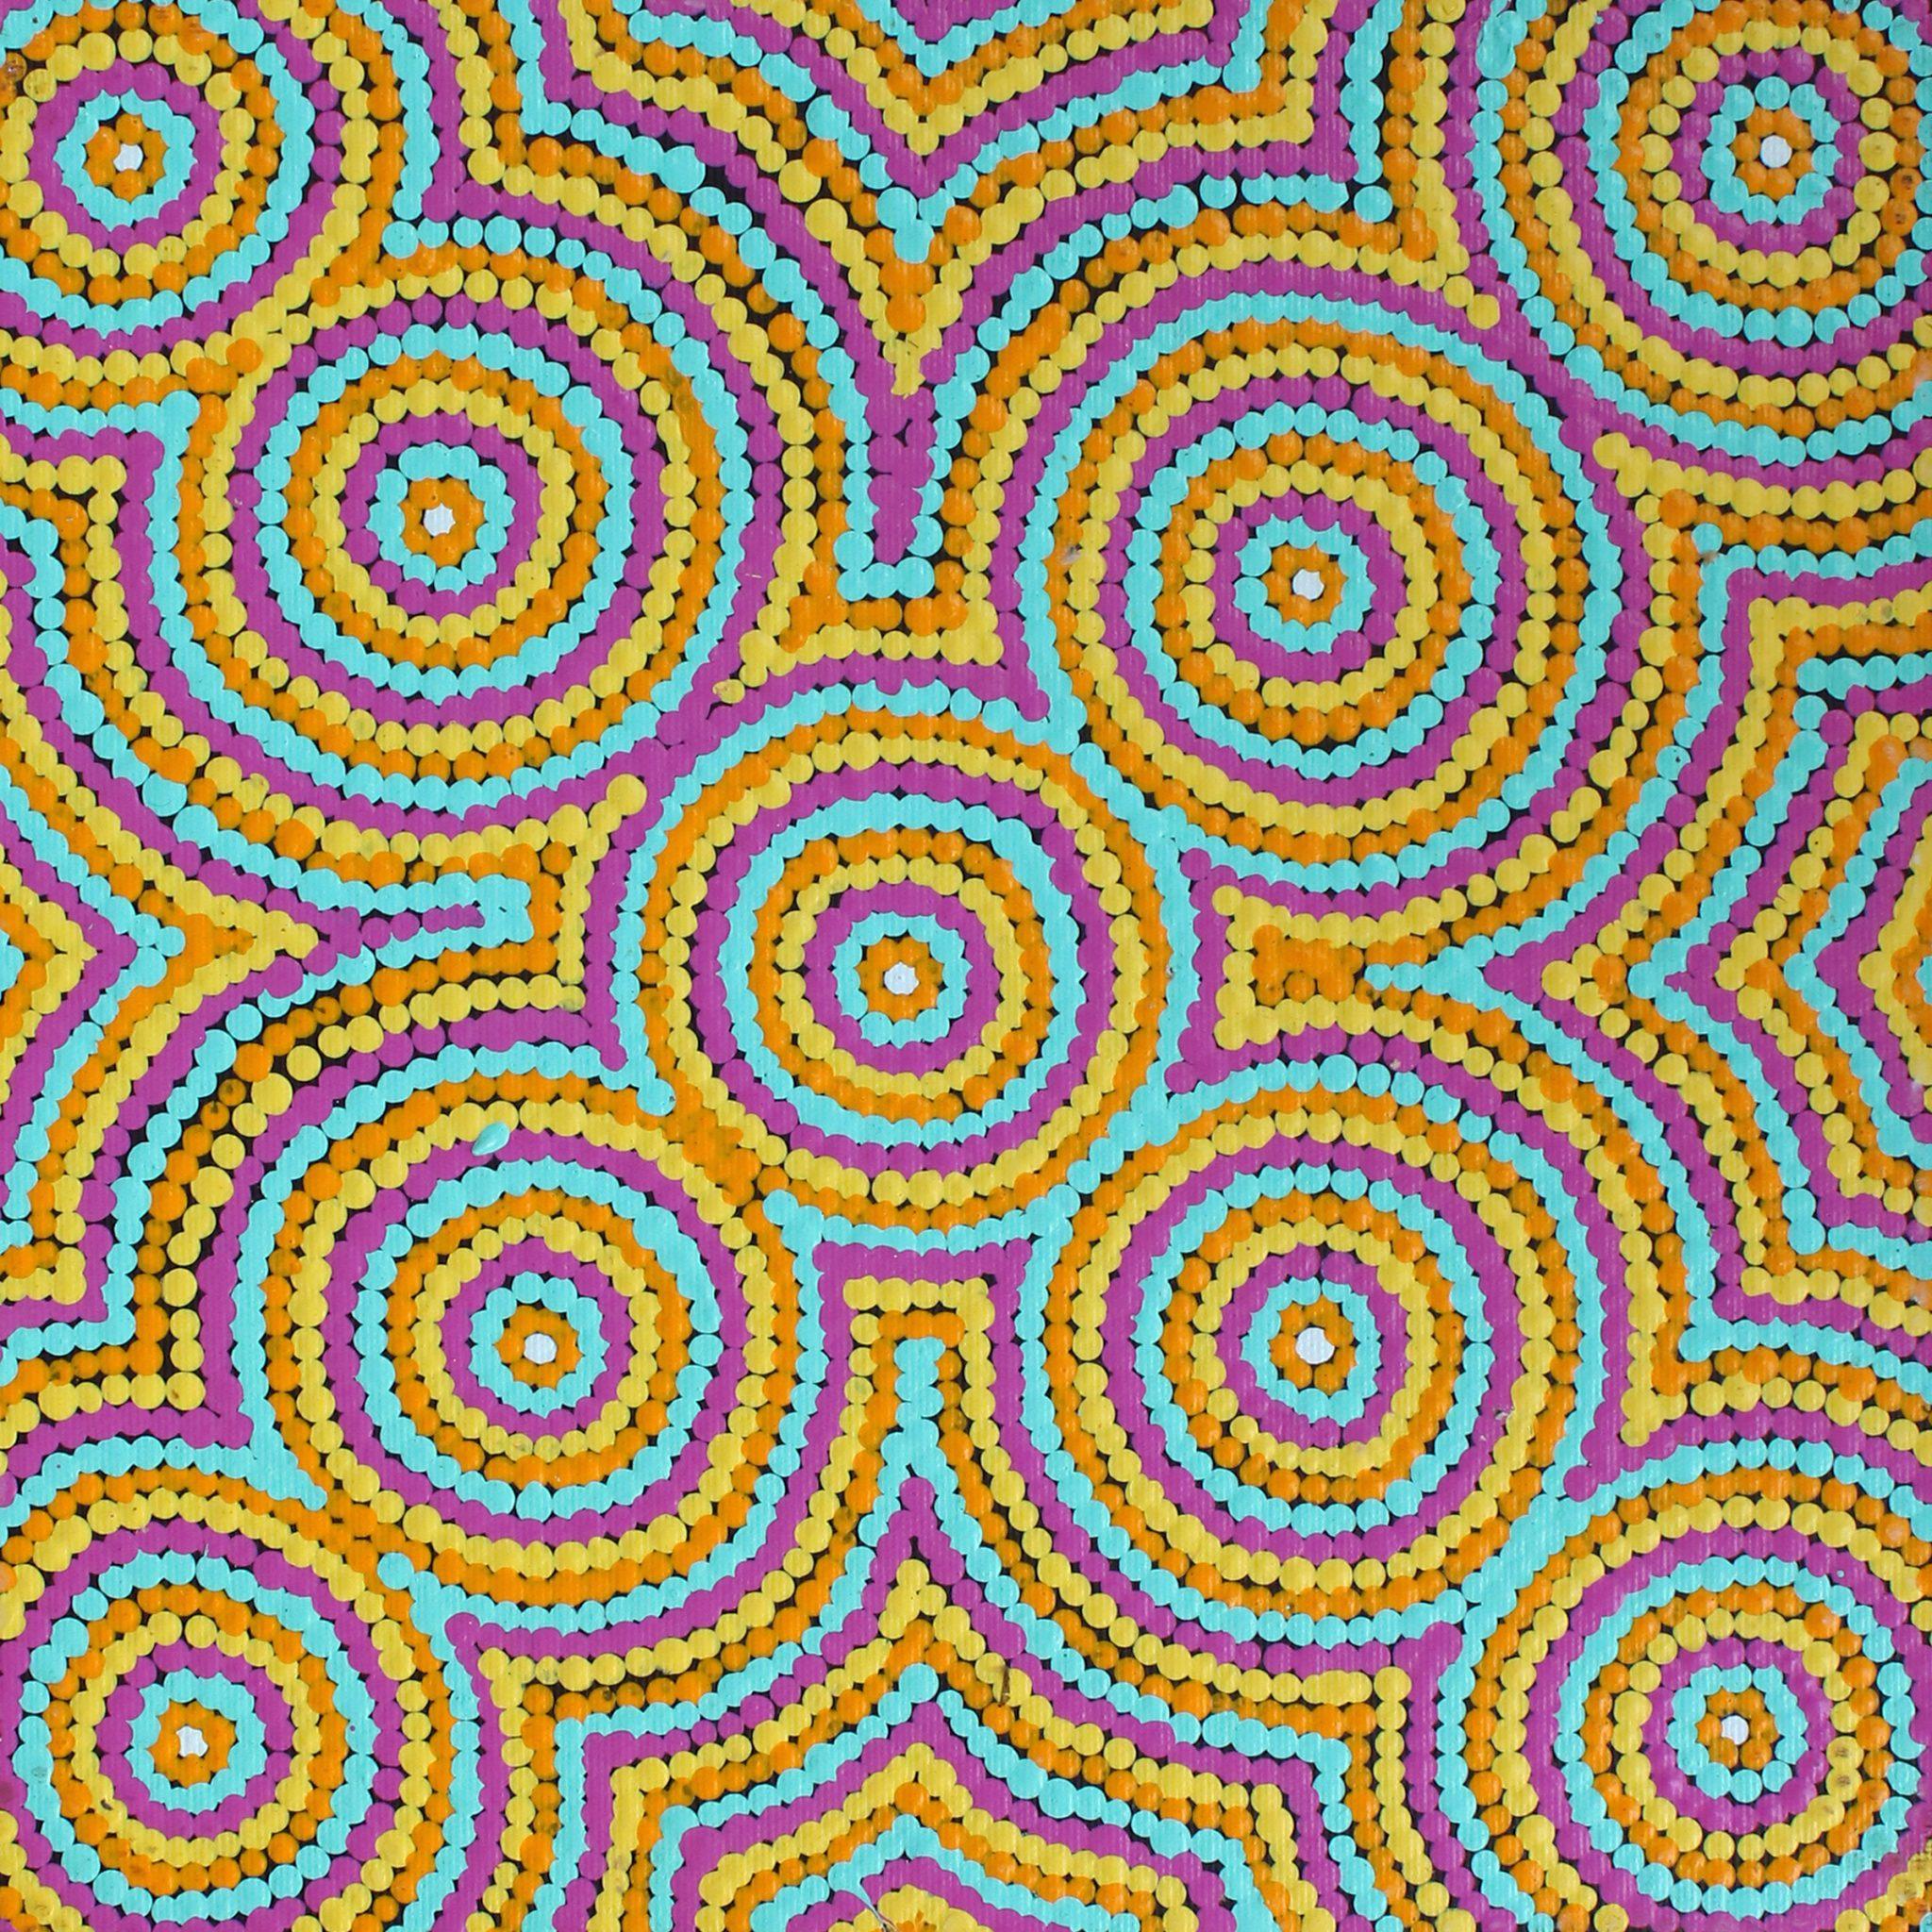 Nguru Yurntumu-Wana (Country Around Yuendumu) by Cecilia Napurrurla Wilson